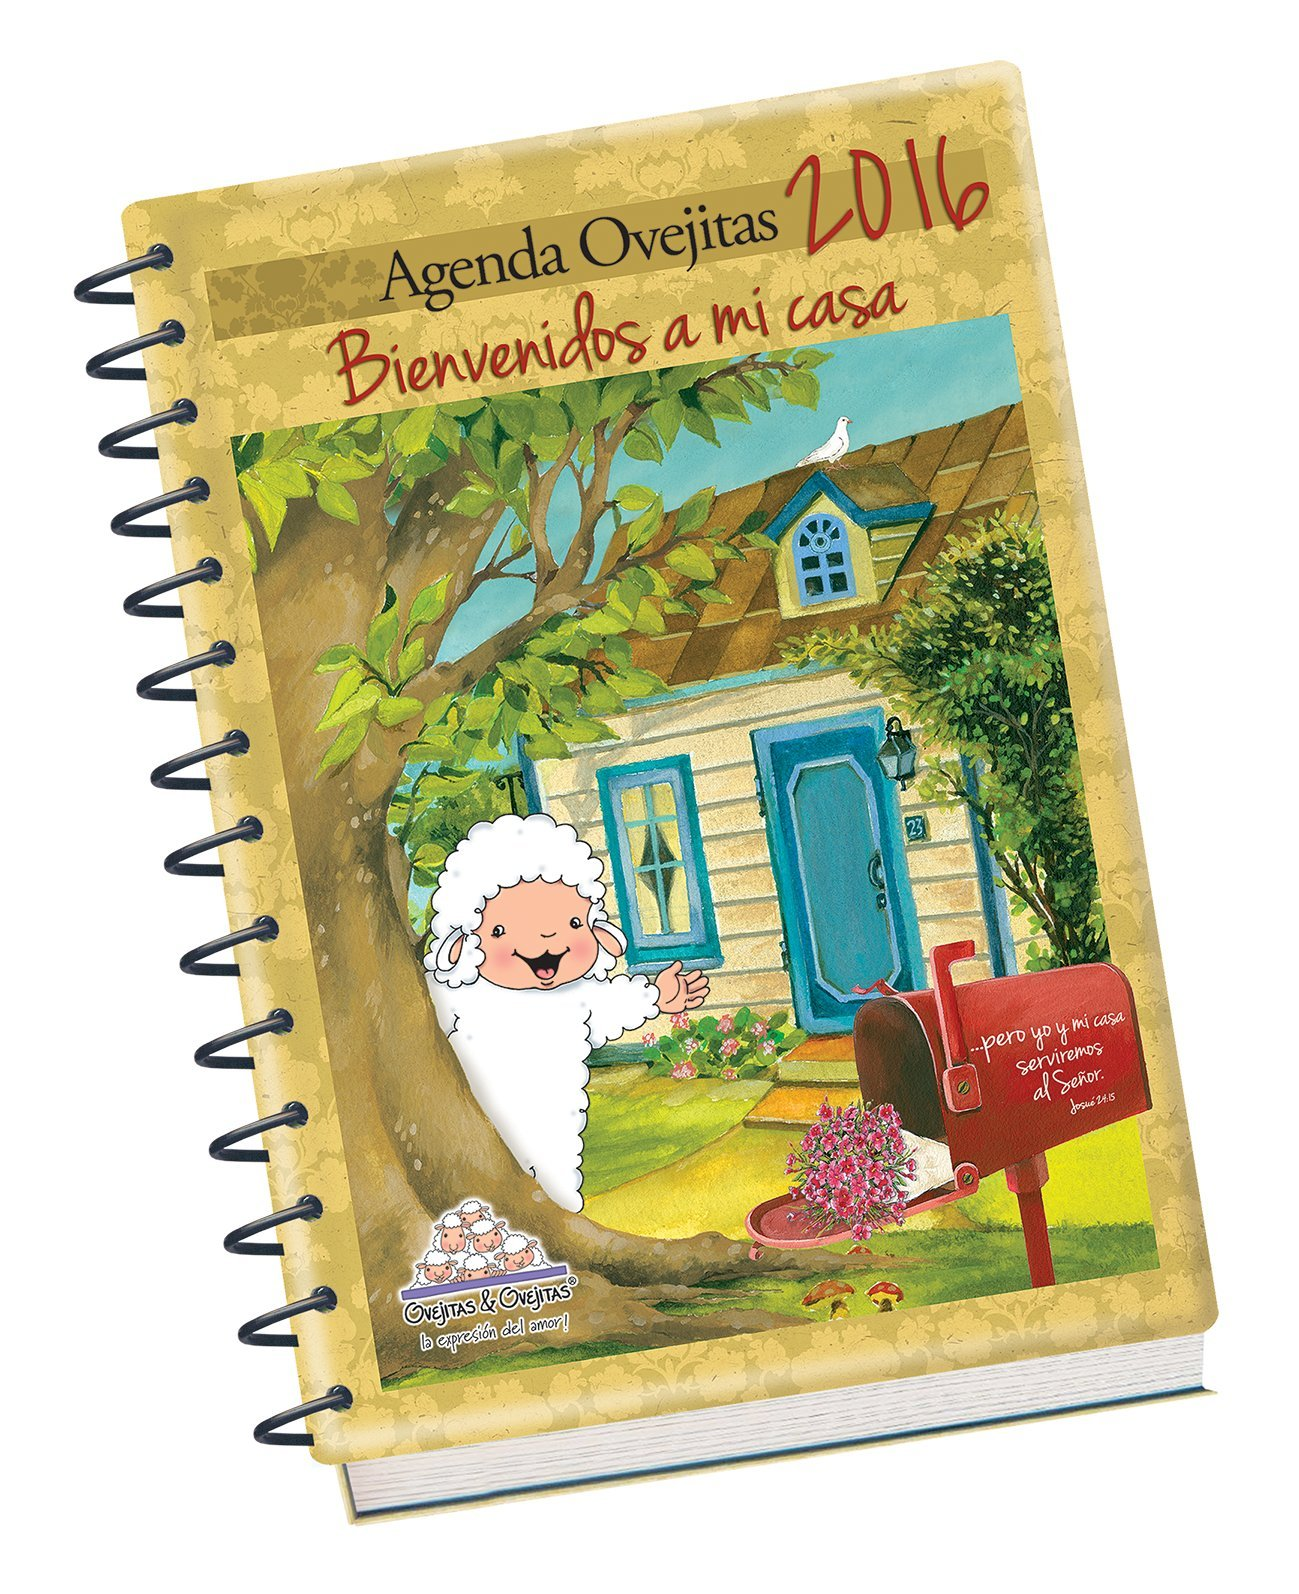 Agenda Ovejitas 2016: Amazon.com: Books